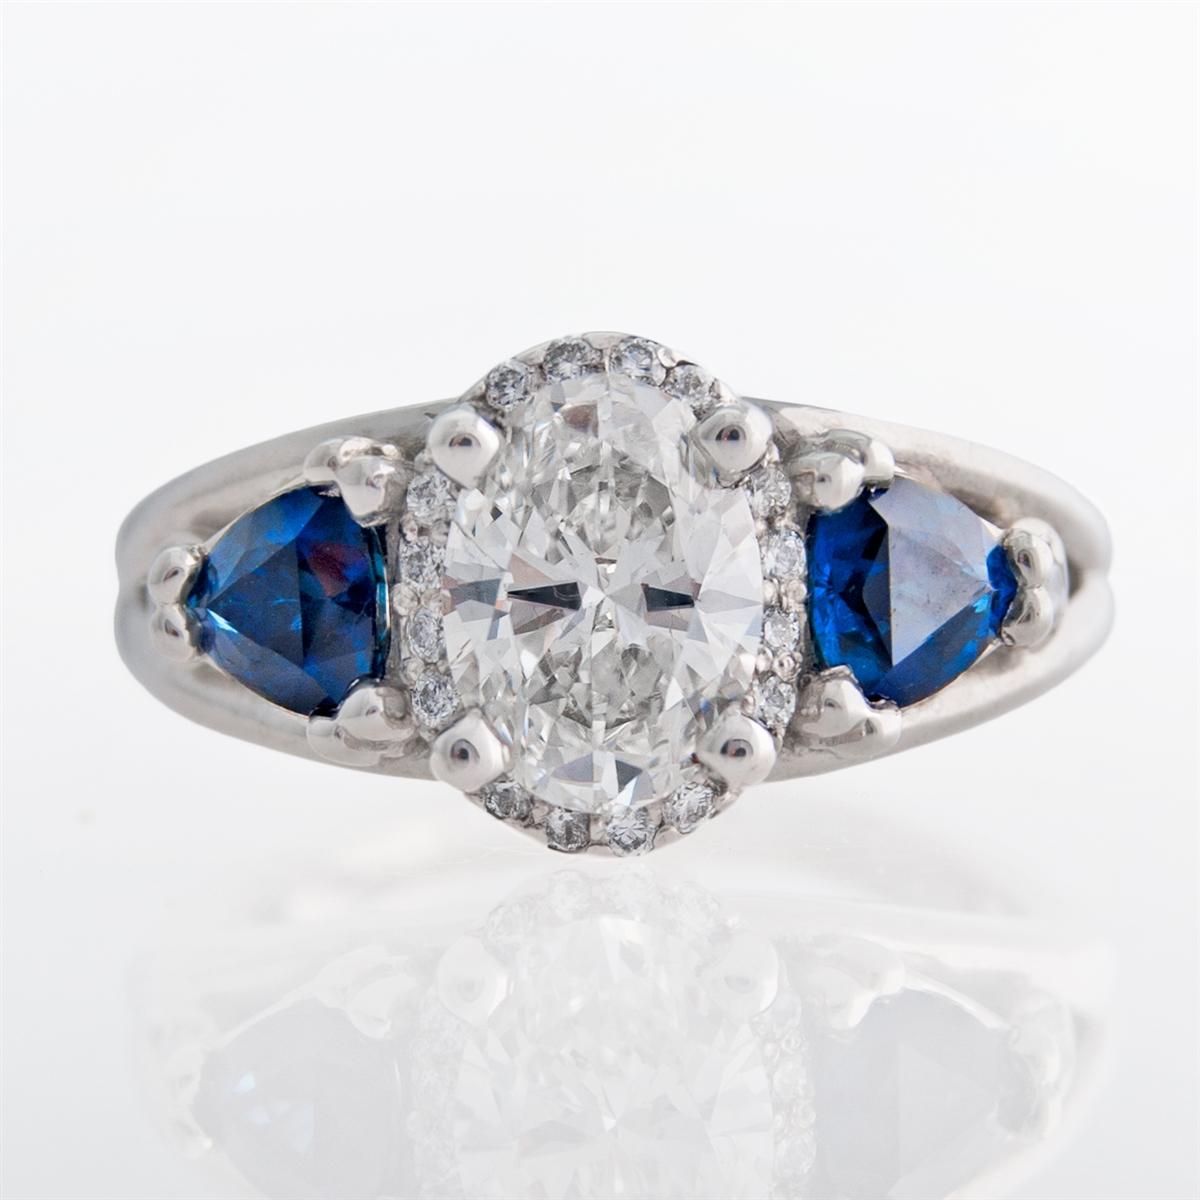 Three Stone Oval Halo Diamond Ring With Trillion Sapphires